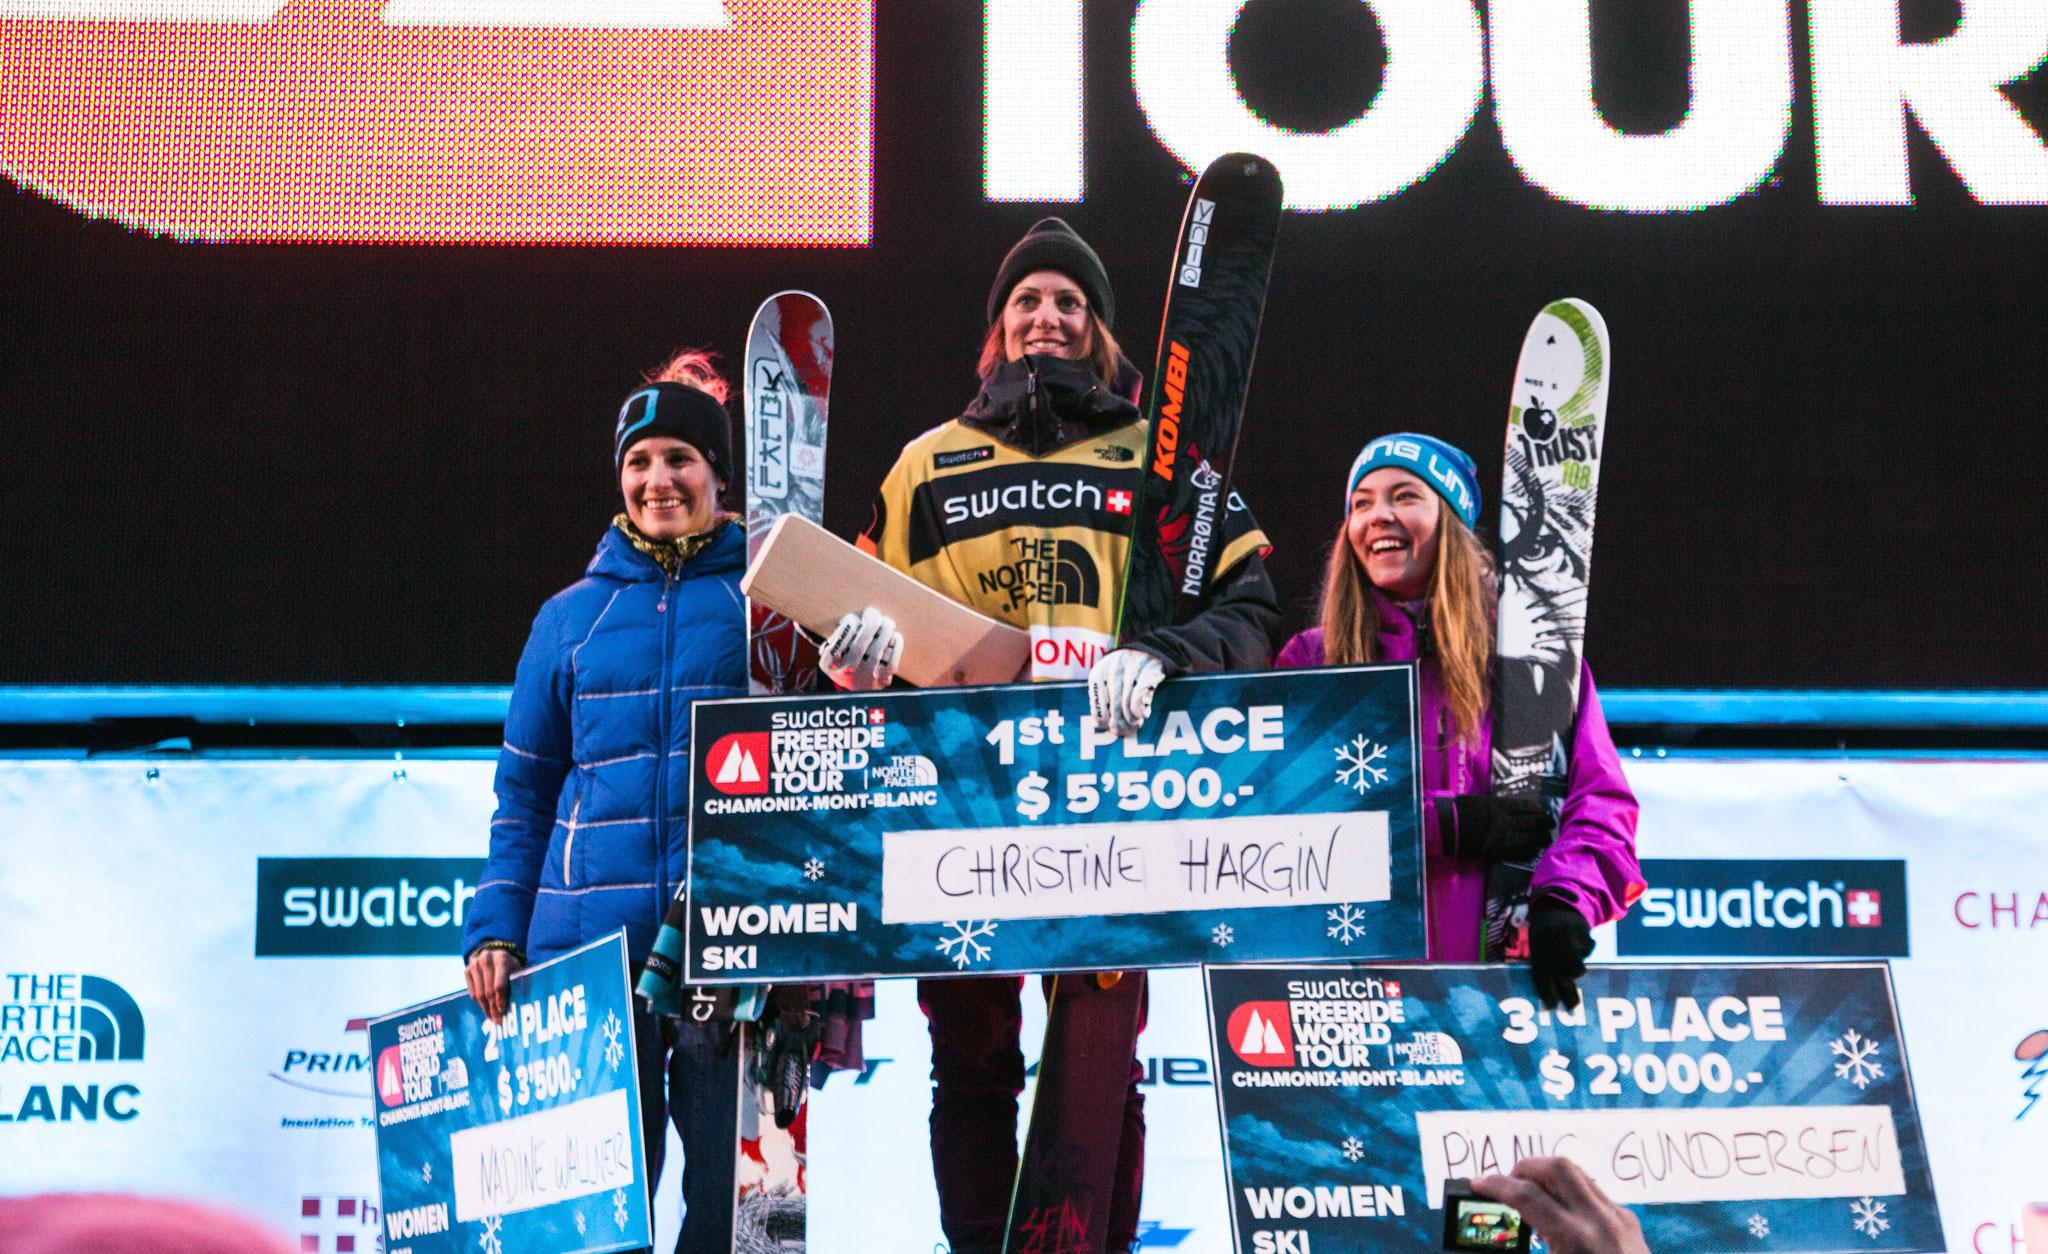 The women's podium at the Freeride World Tour in Chamonix: Christine Hargin, Nadine Wallner, and Pia Nic Gunderson.